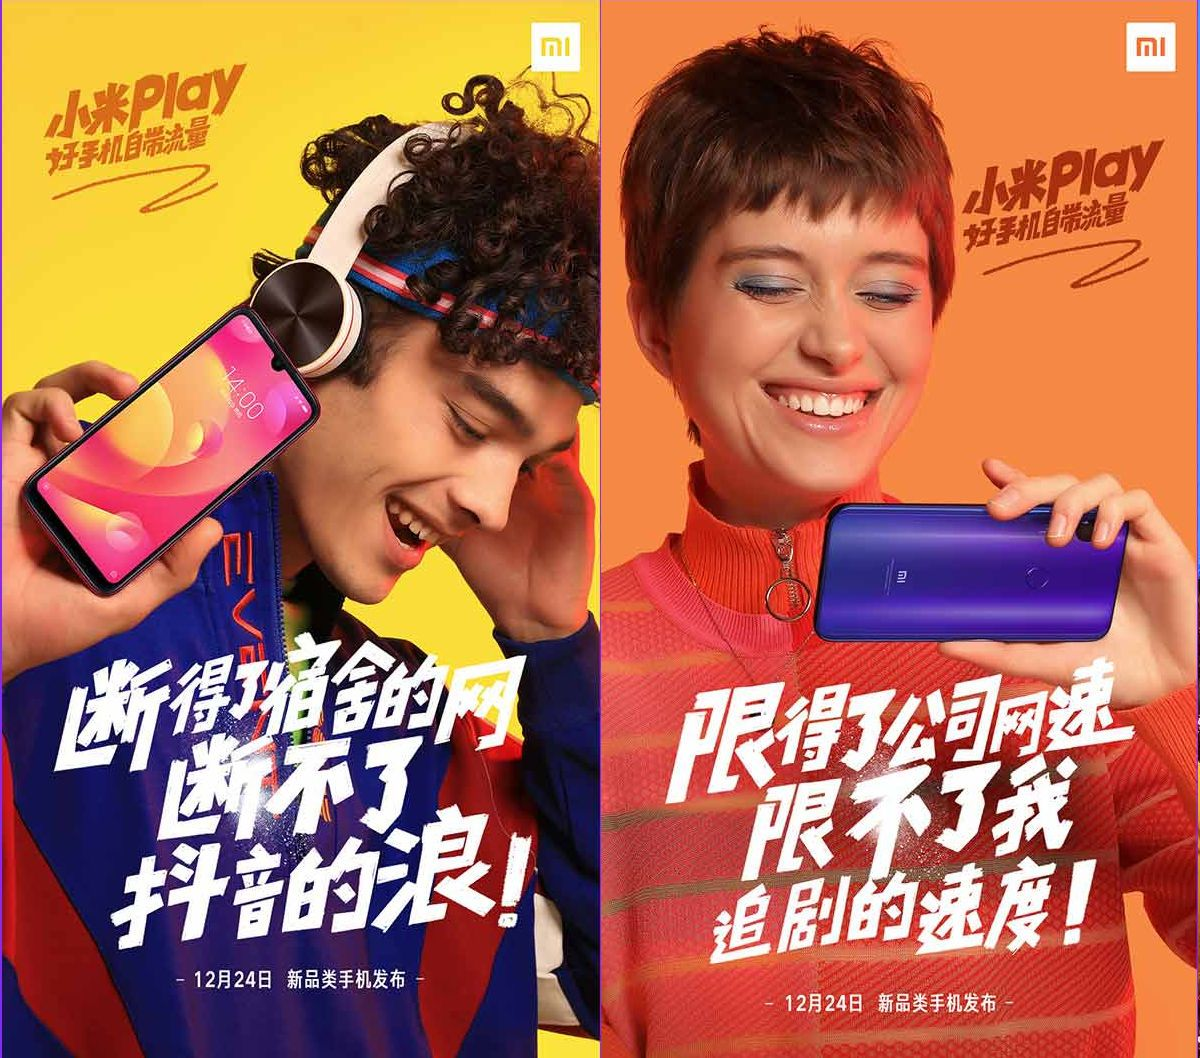 Werbung Smartphone Handy China